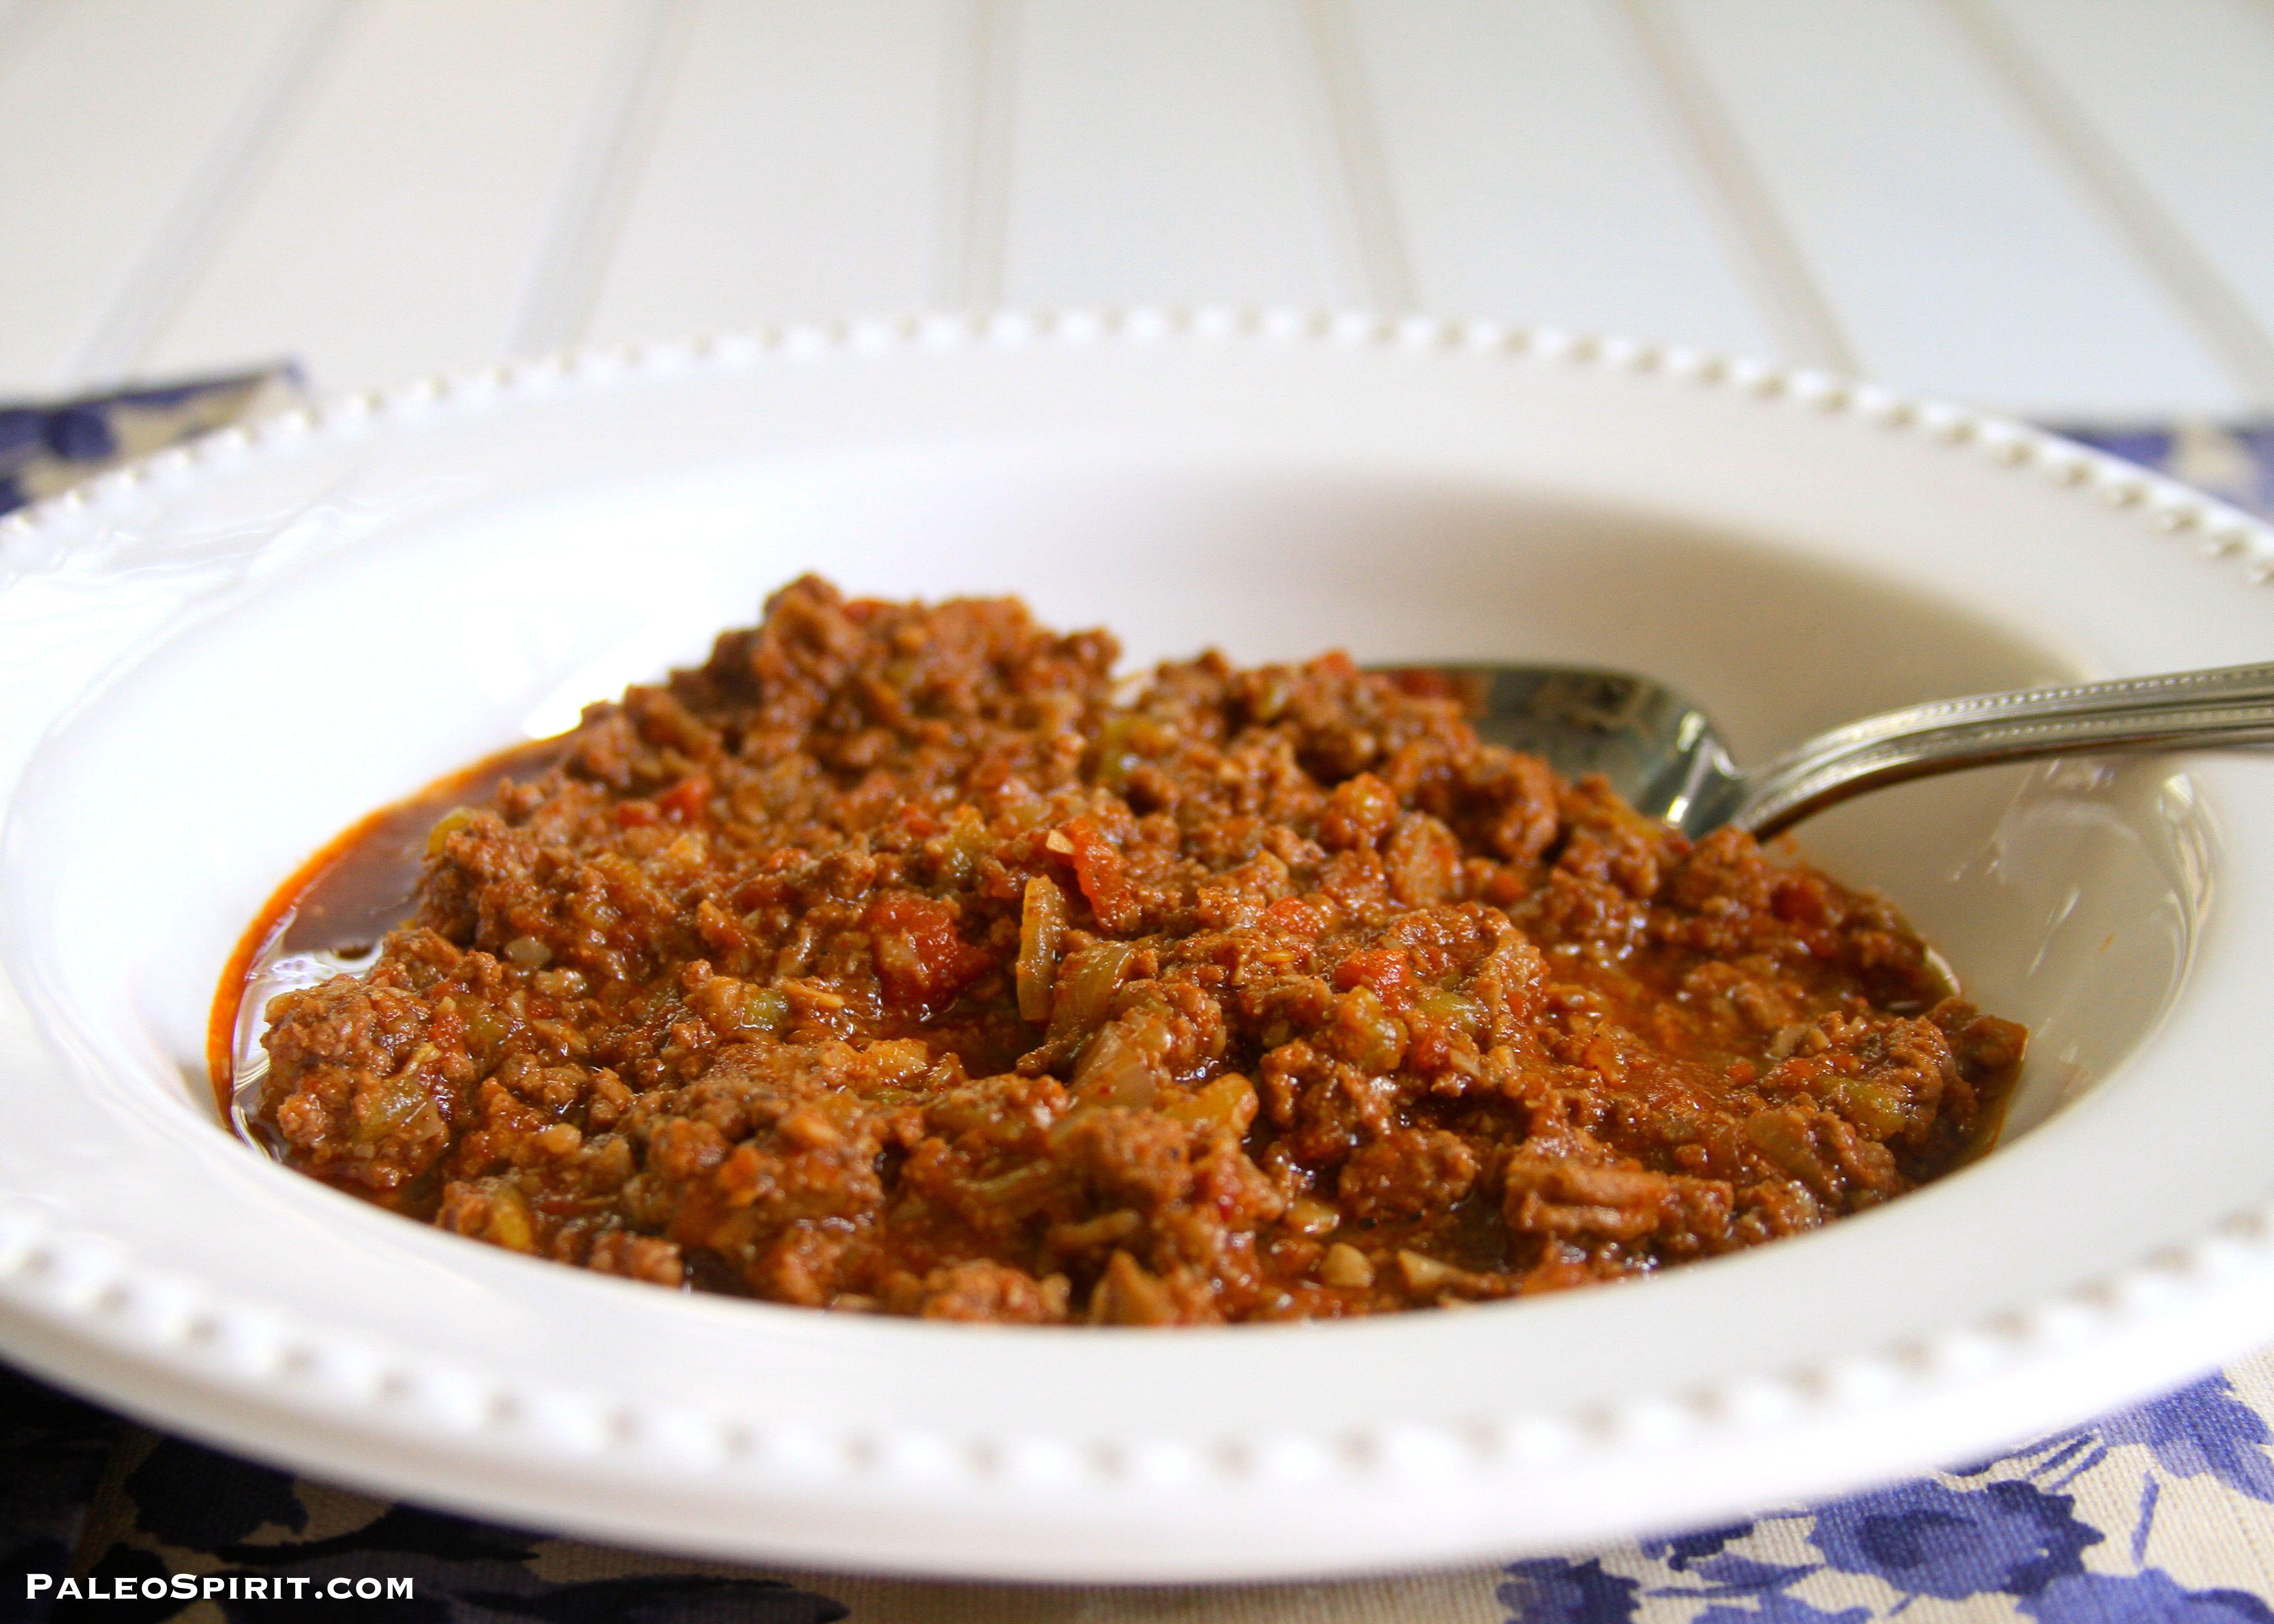 Paleo Chipotle Chili recipe. Easy, low-carb, spicy, no bean paleo chili